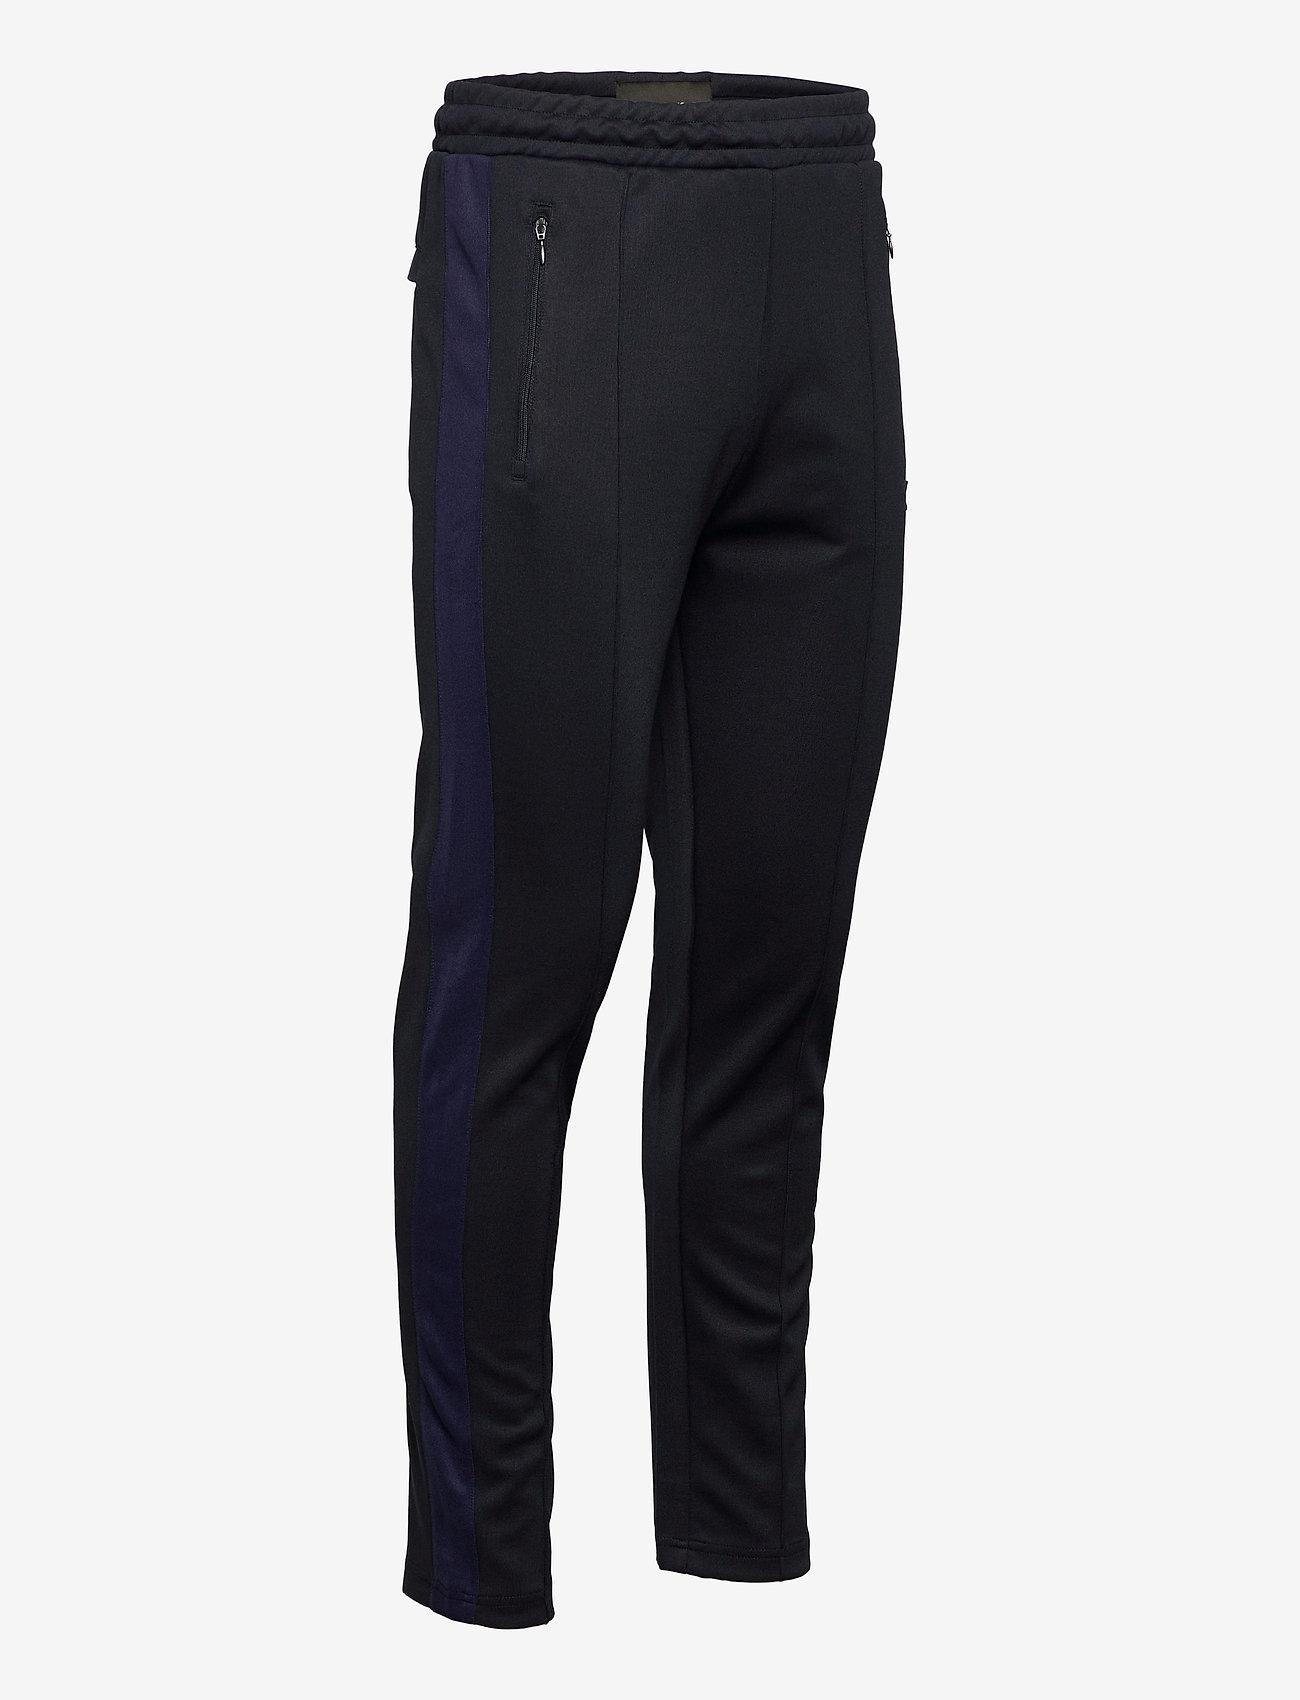 Lyle & Scott Tricot Sweatpant With Side Stripe - Joggebukser DARK NAVY - Menn Klær